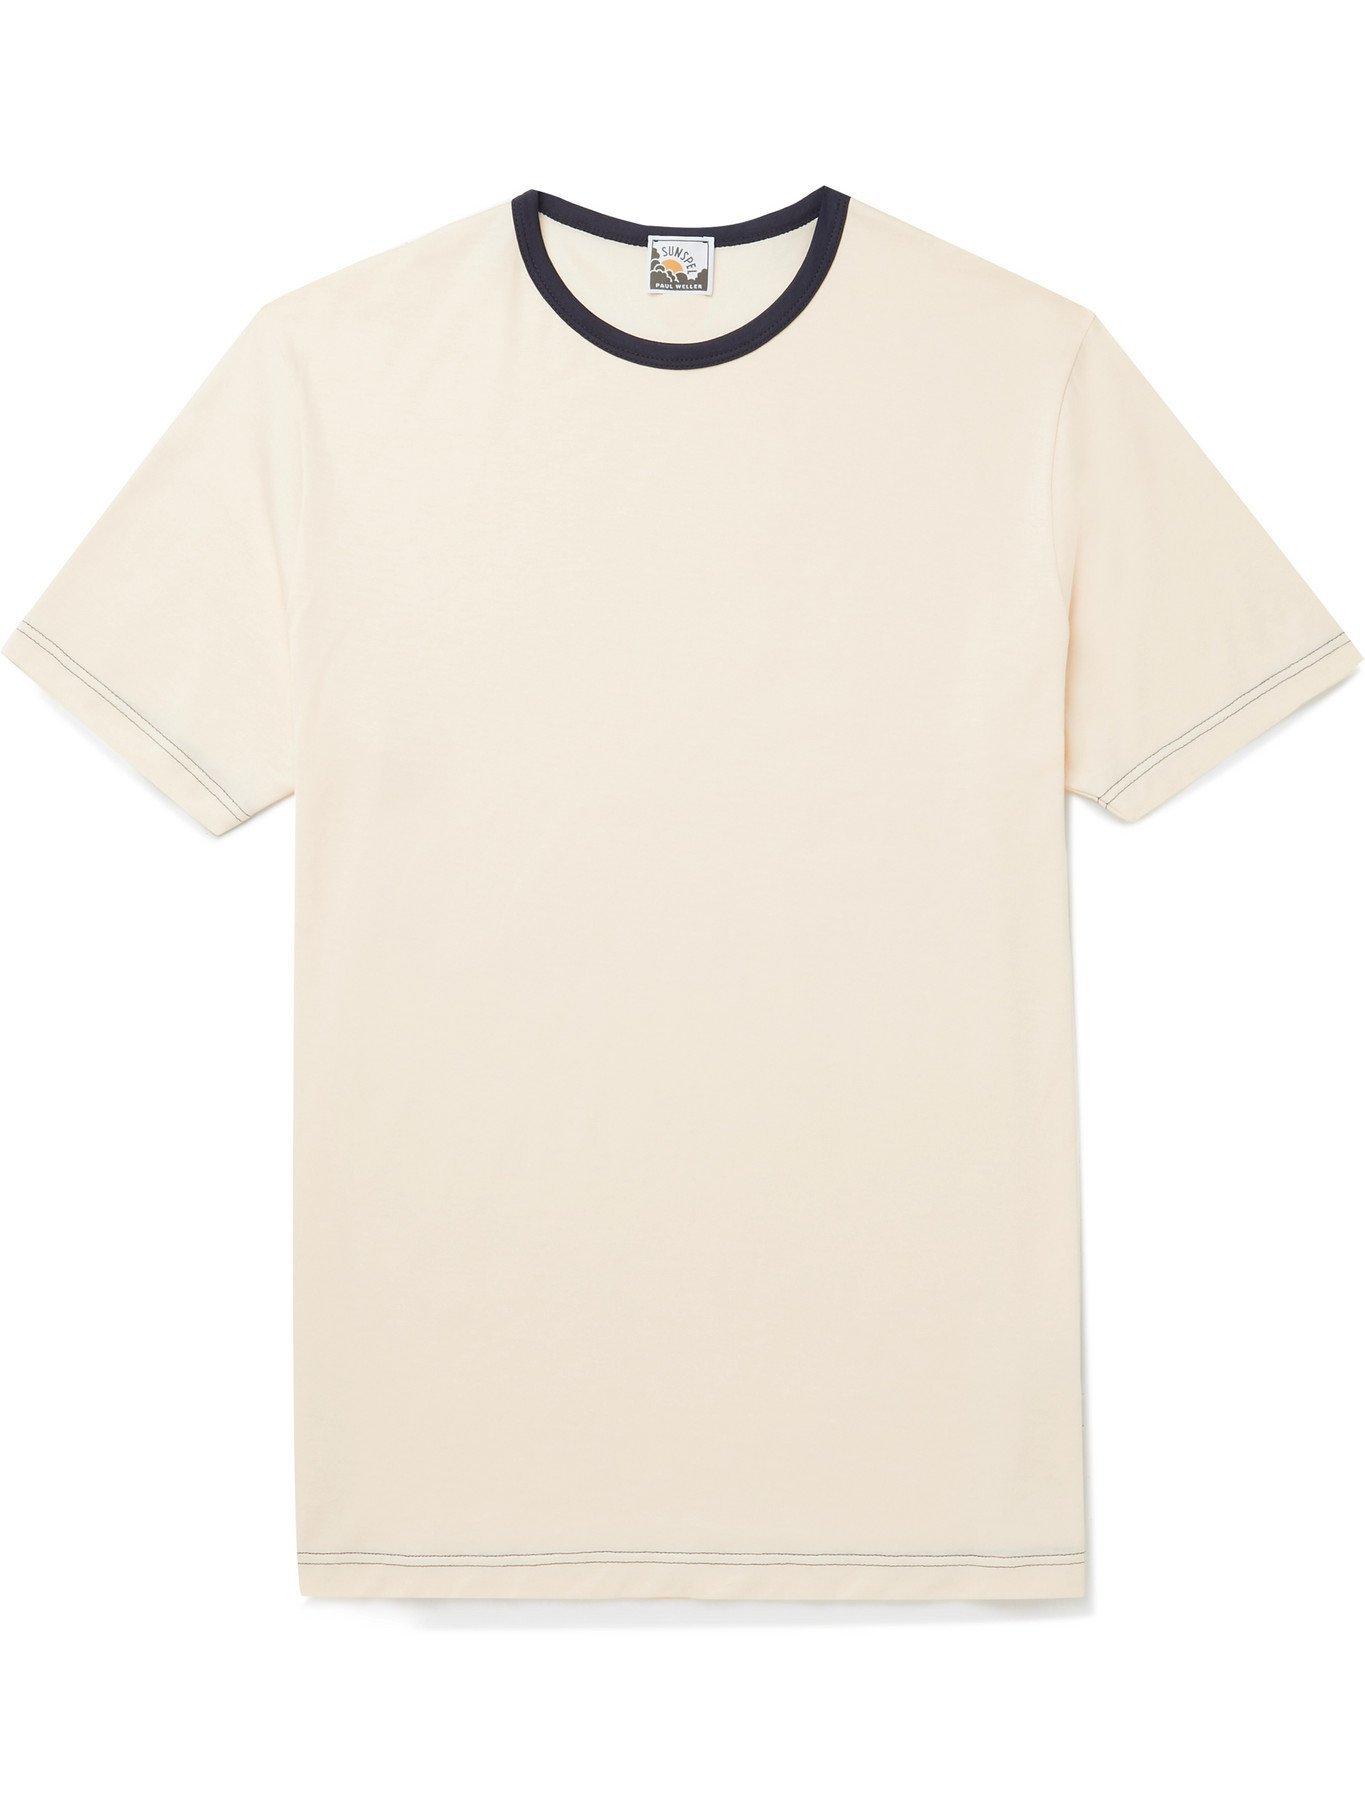 SUNSPEL - Paul Weller Slim-Fit Contrast-Tipped Cotton-Jersey T-Shirt - White - S